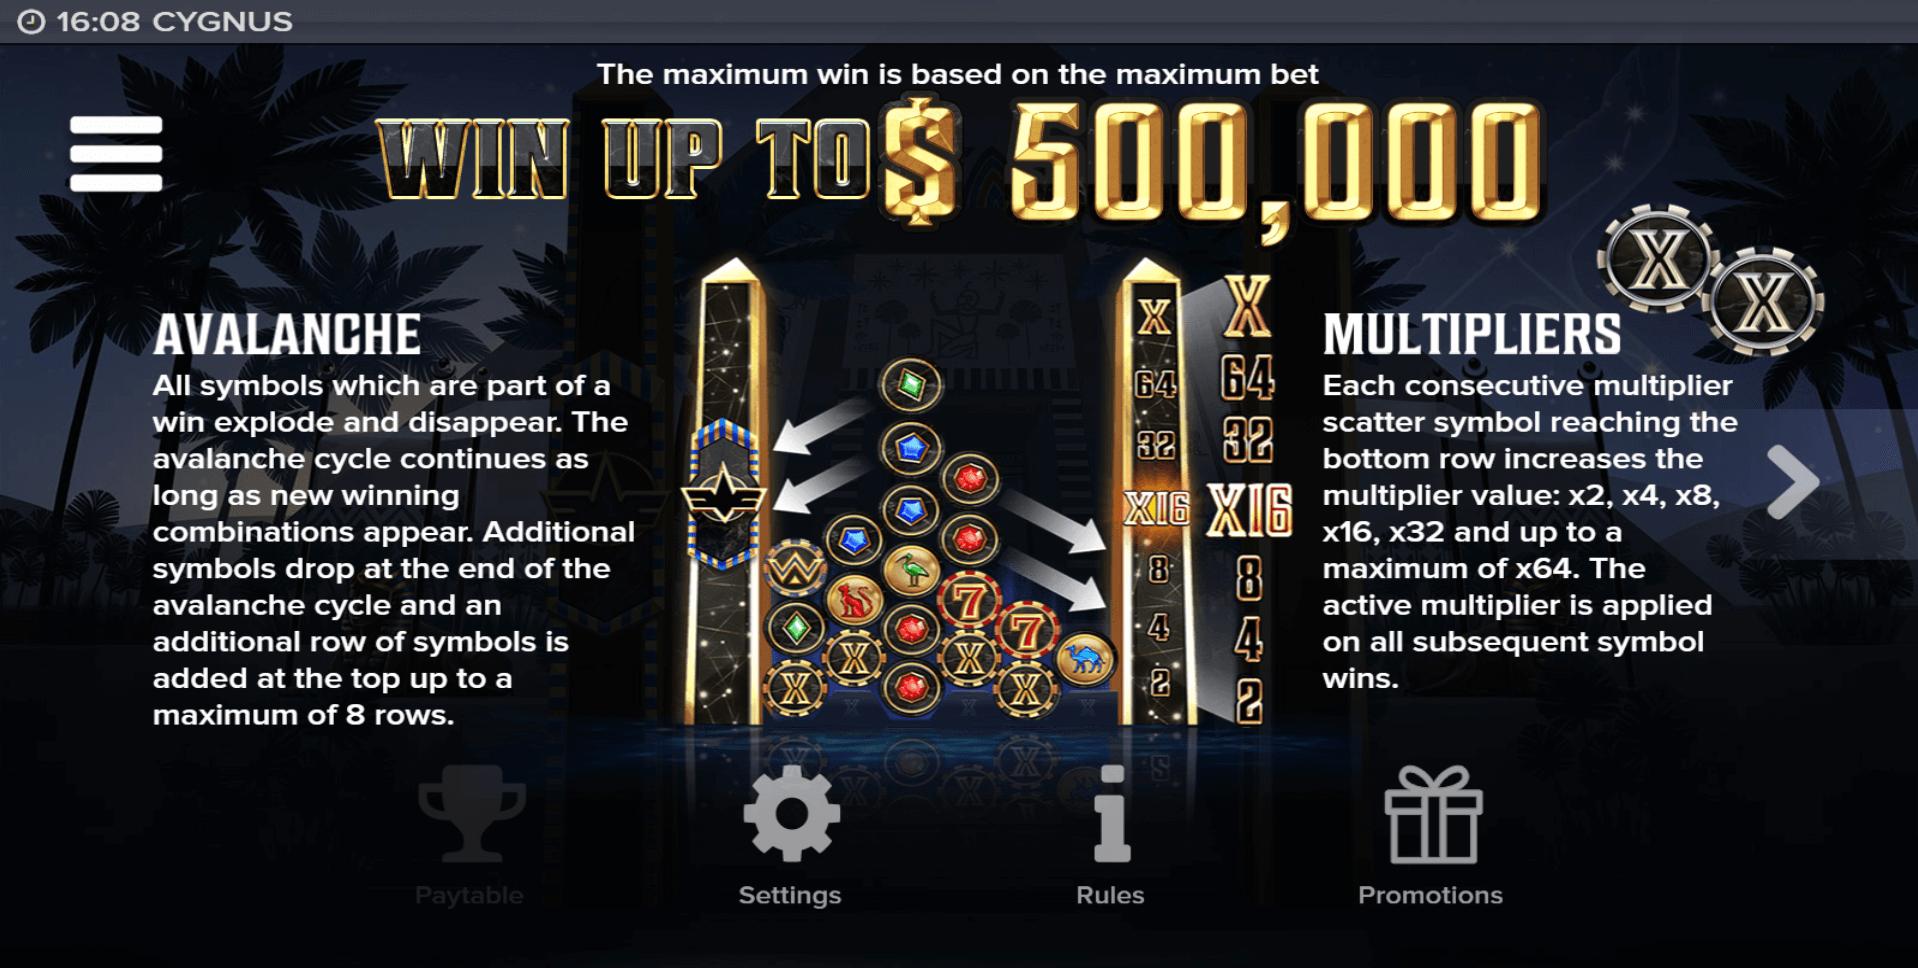 Cygnus Slot Machine